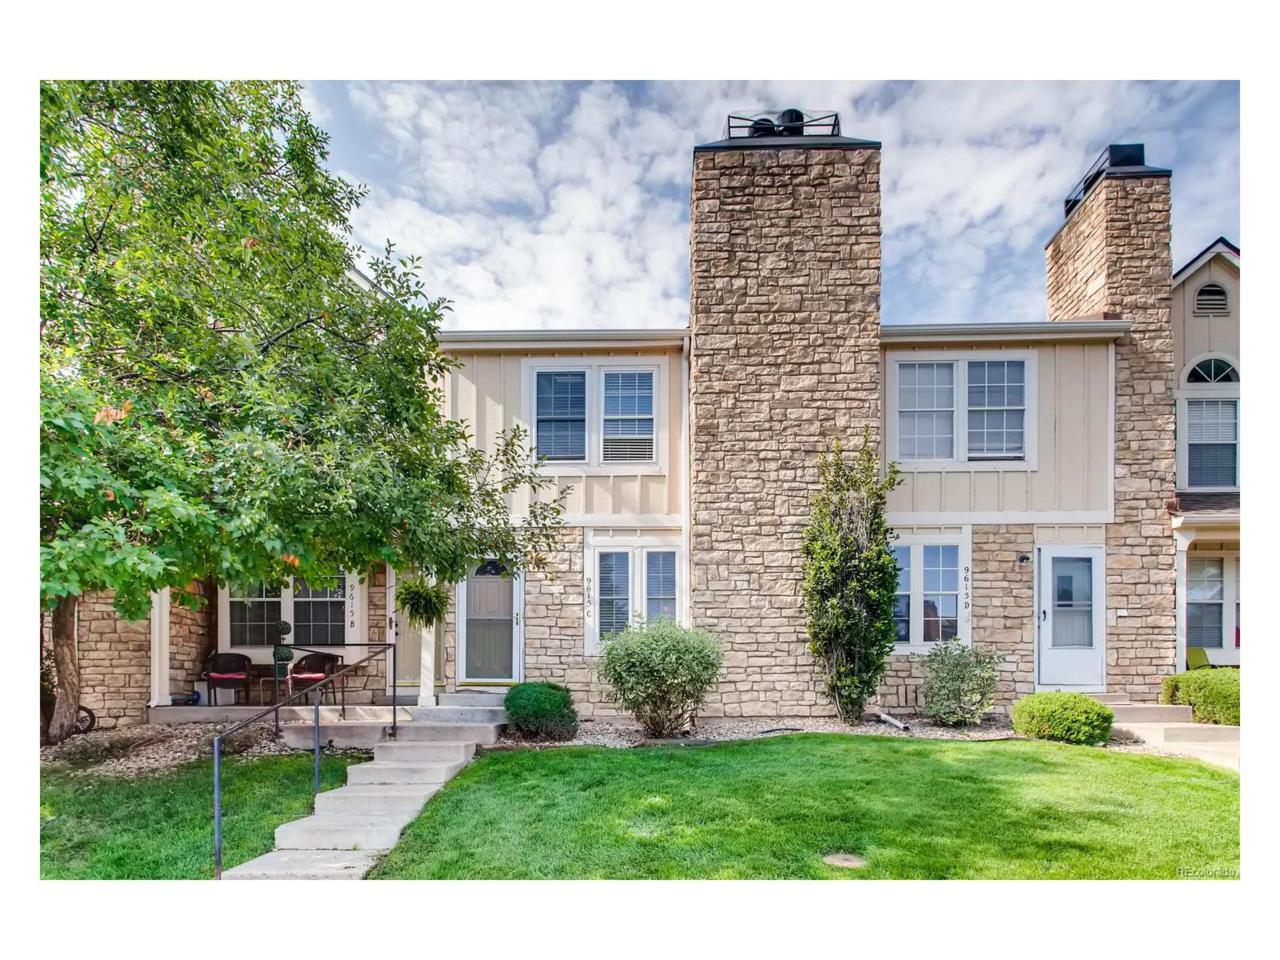 9615 W Chatfield Avenue C, Littleton, CO 80128 (MLS #3276838) :: 8z Real Estate